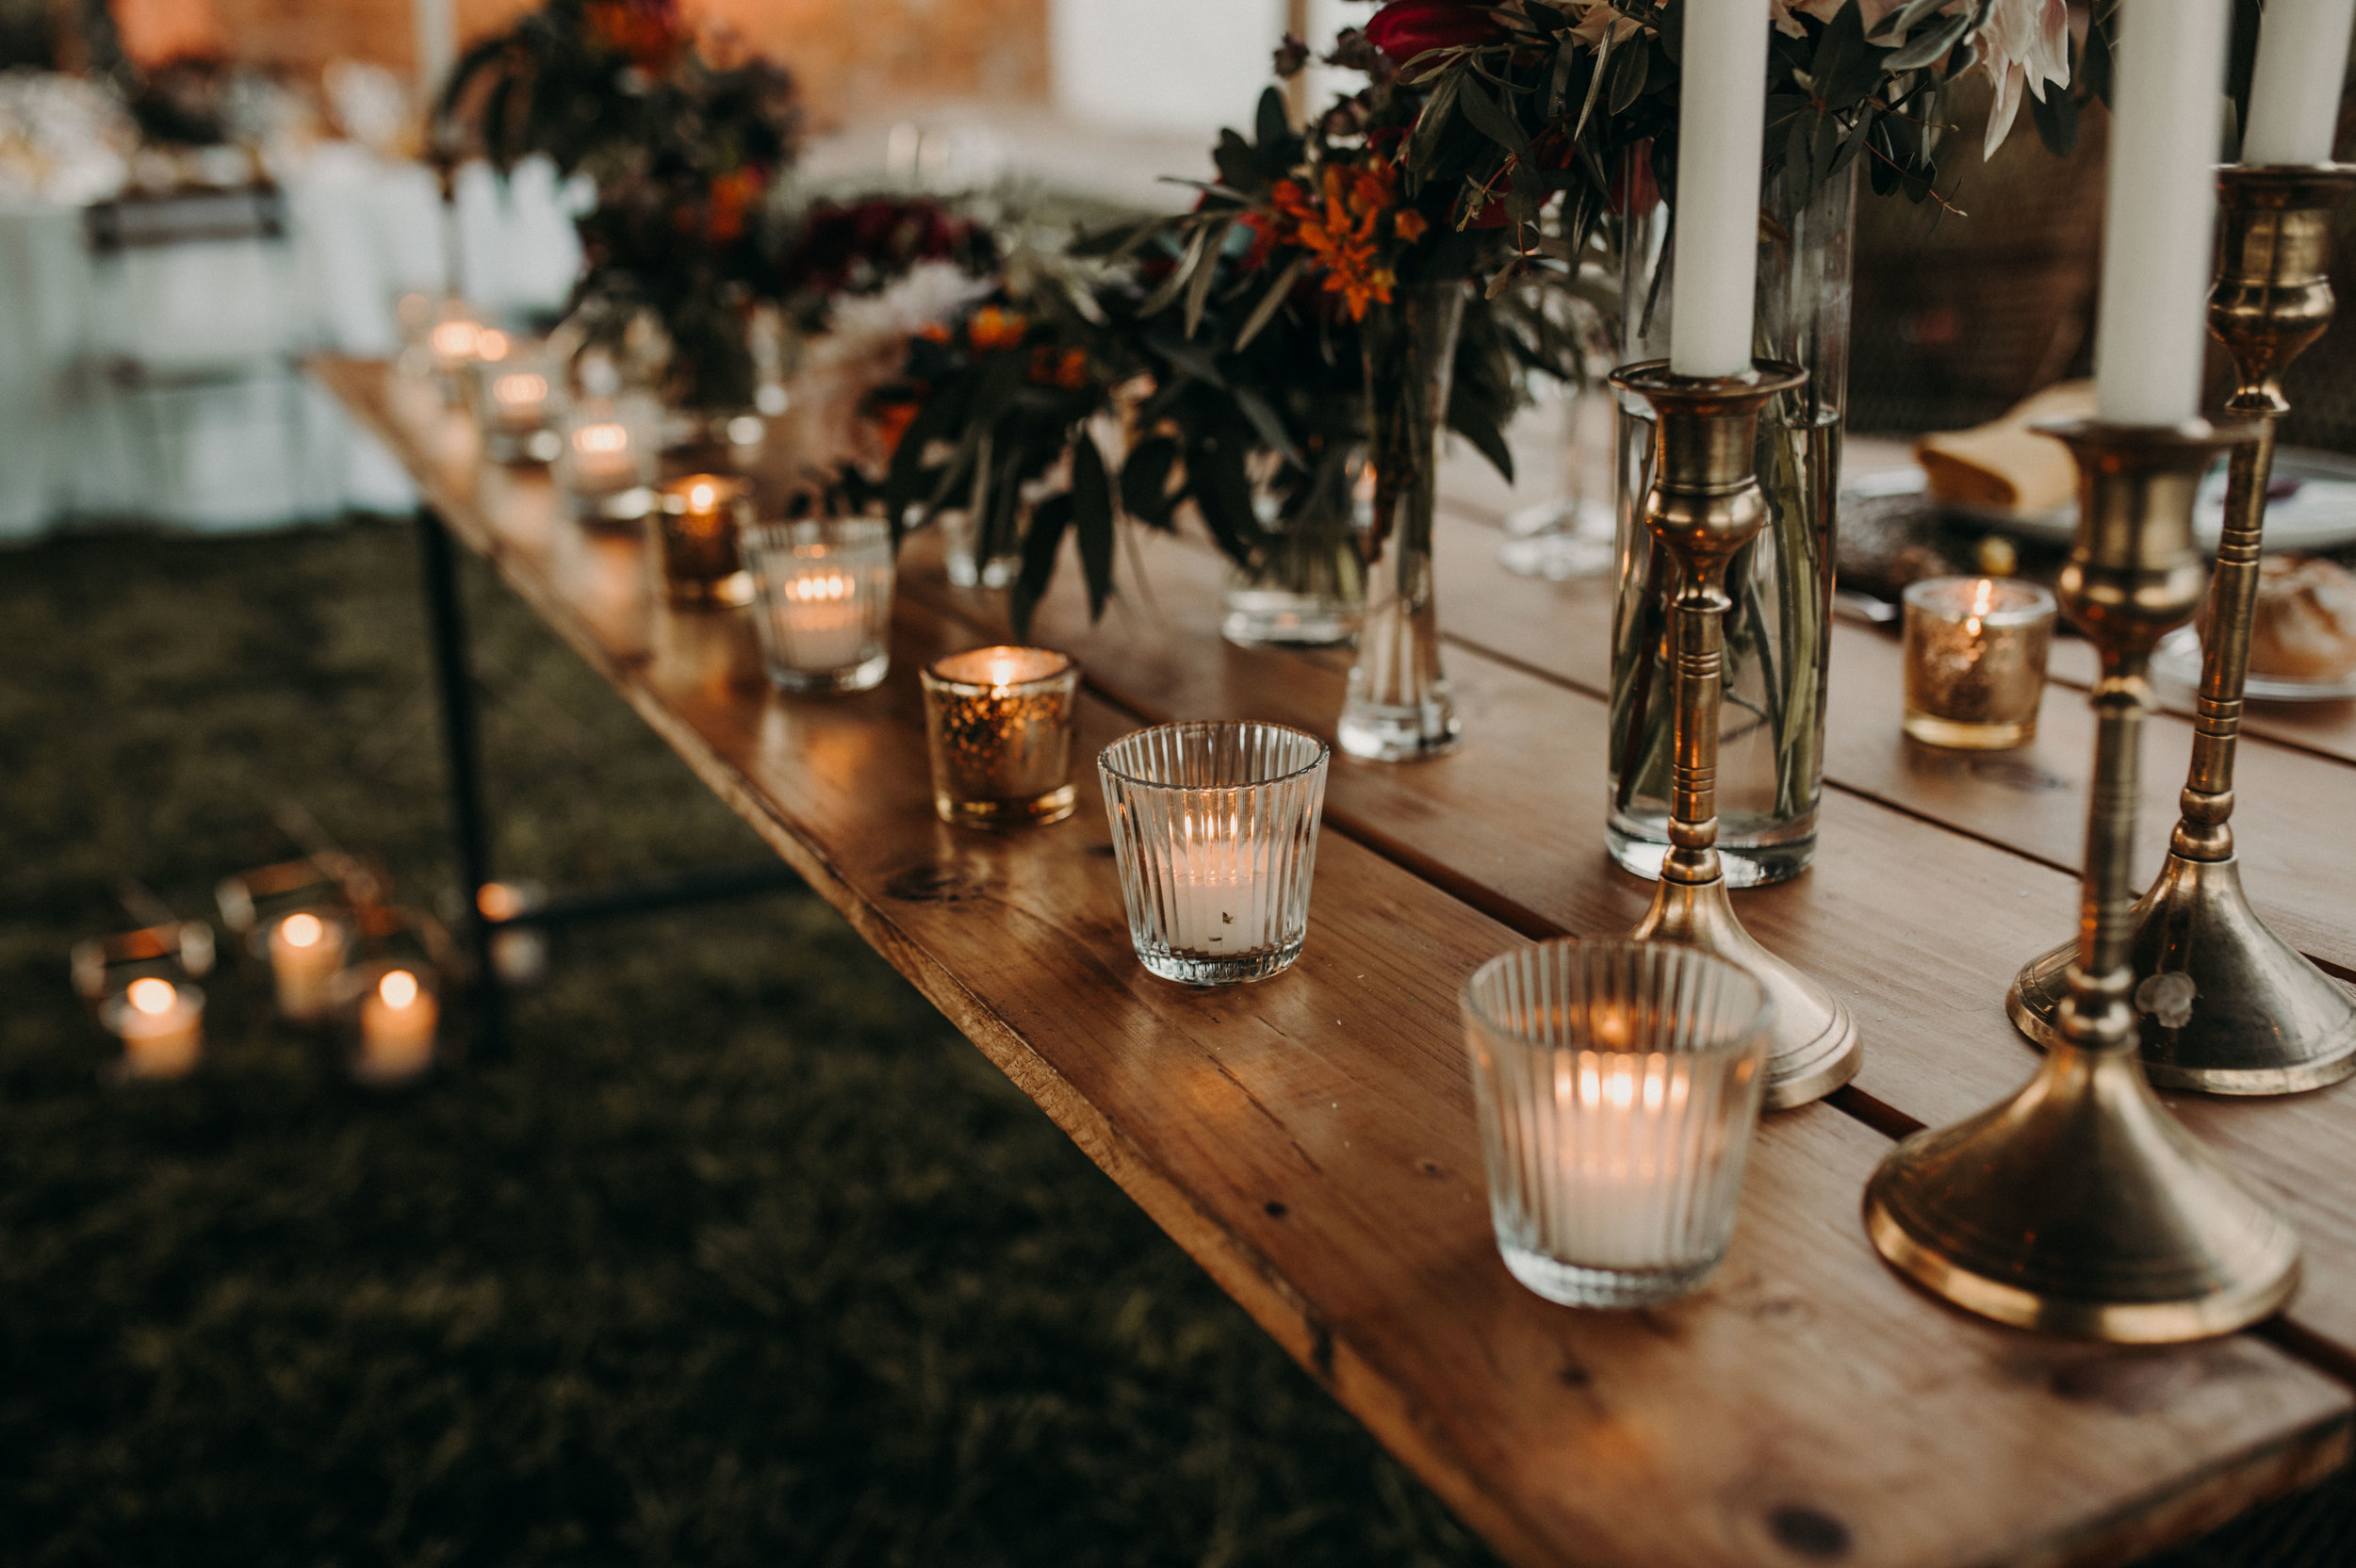 thenortherngirlphotography-fotografa-de-bodas-barcelona_destinartion-wedding-photographer_wedding-photographer_moroccan-wedding_HADNANANTIGONA-1029.jpg